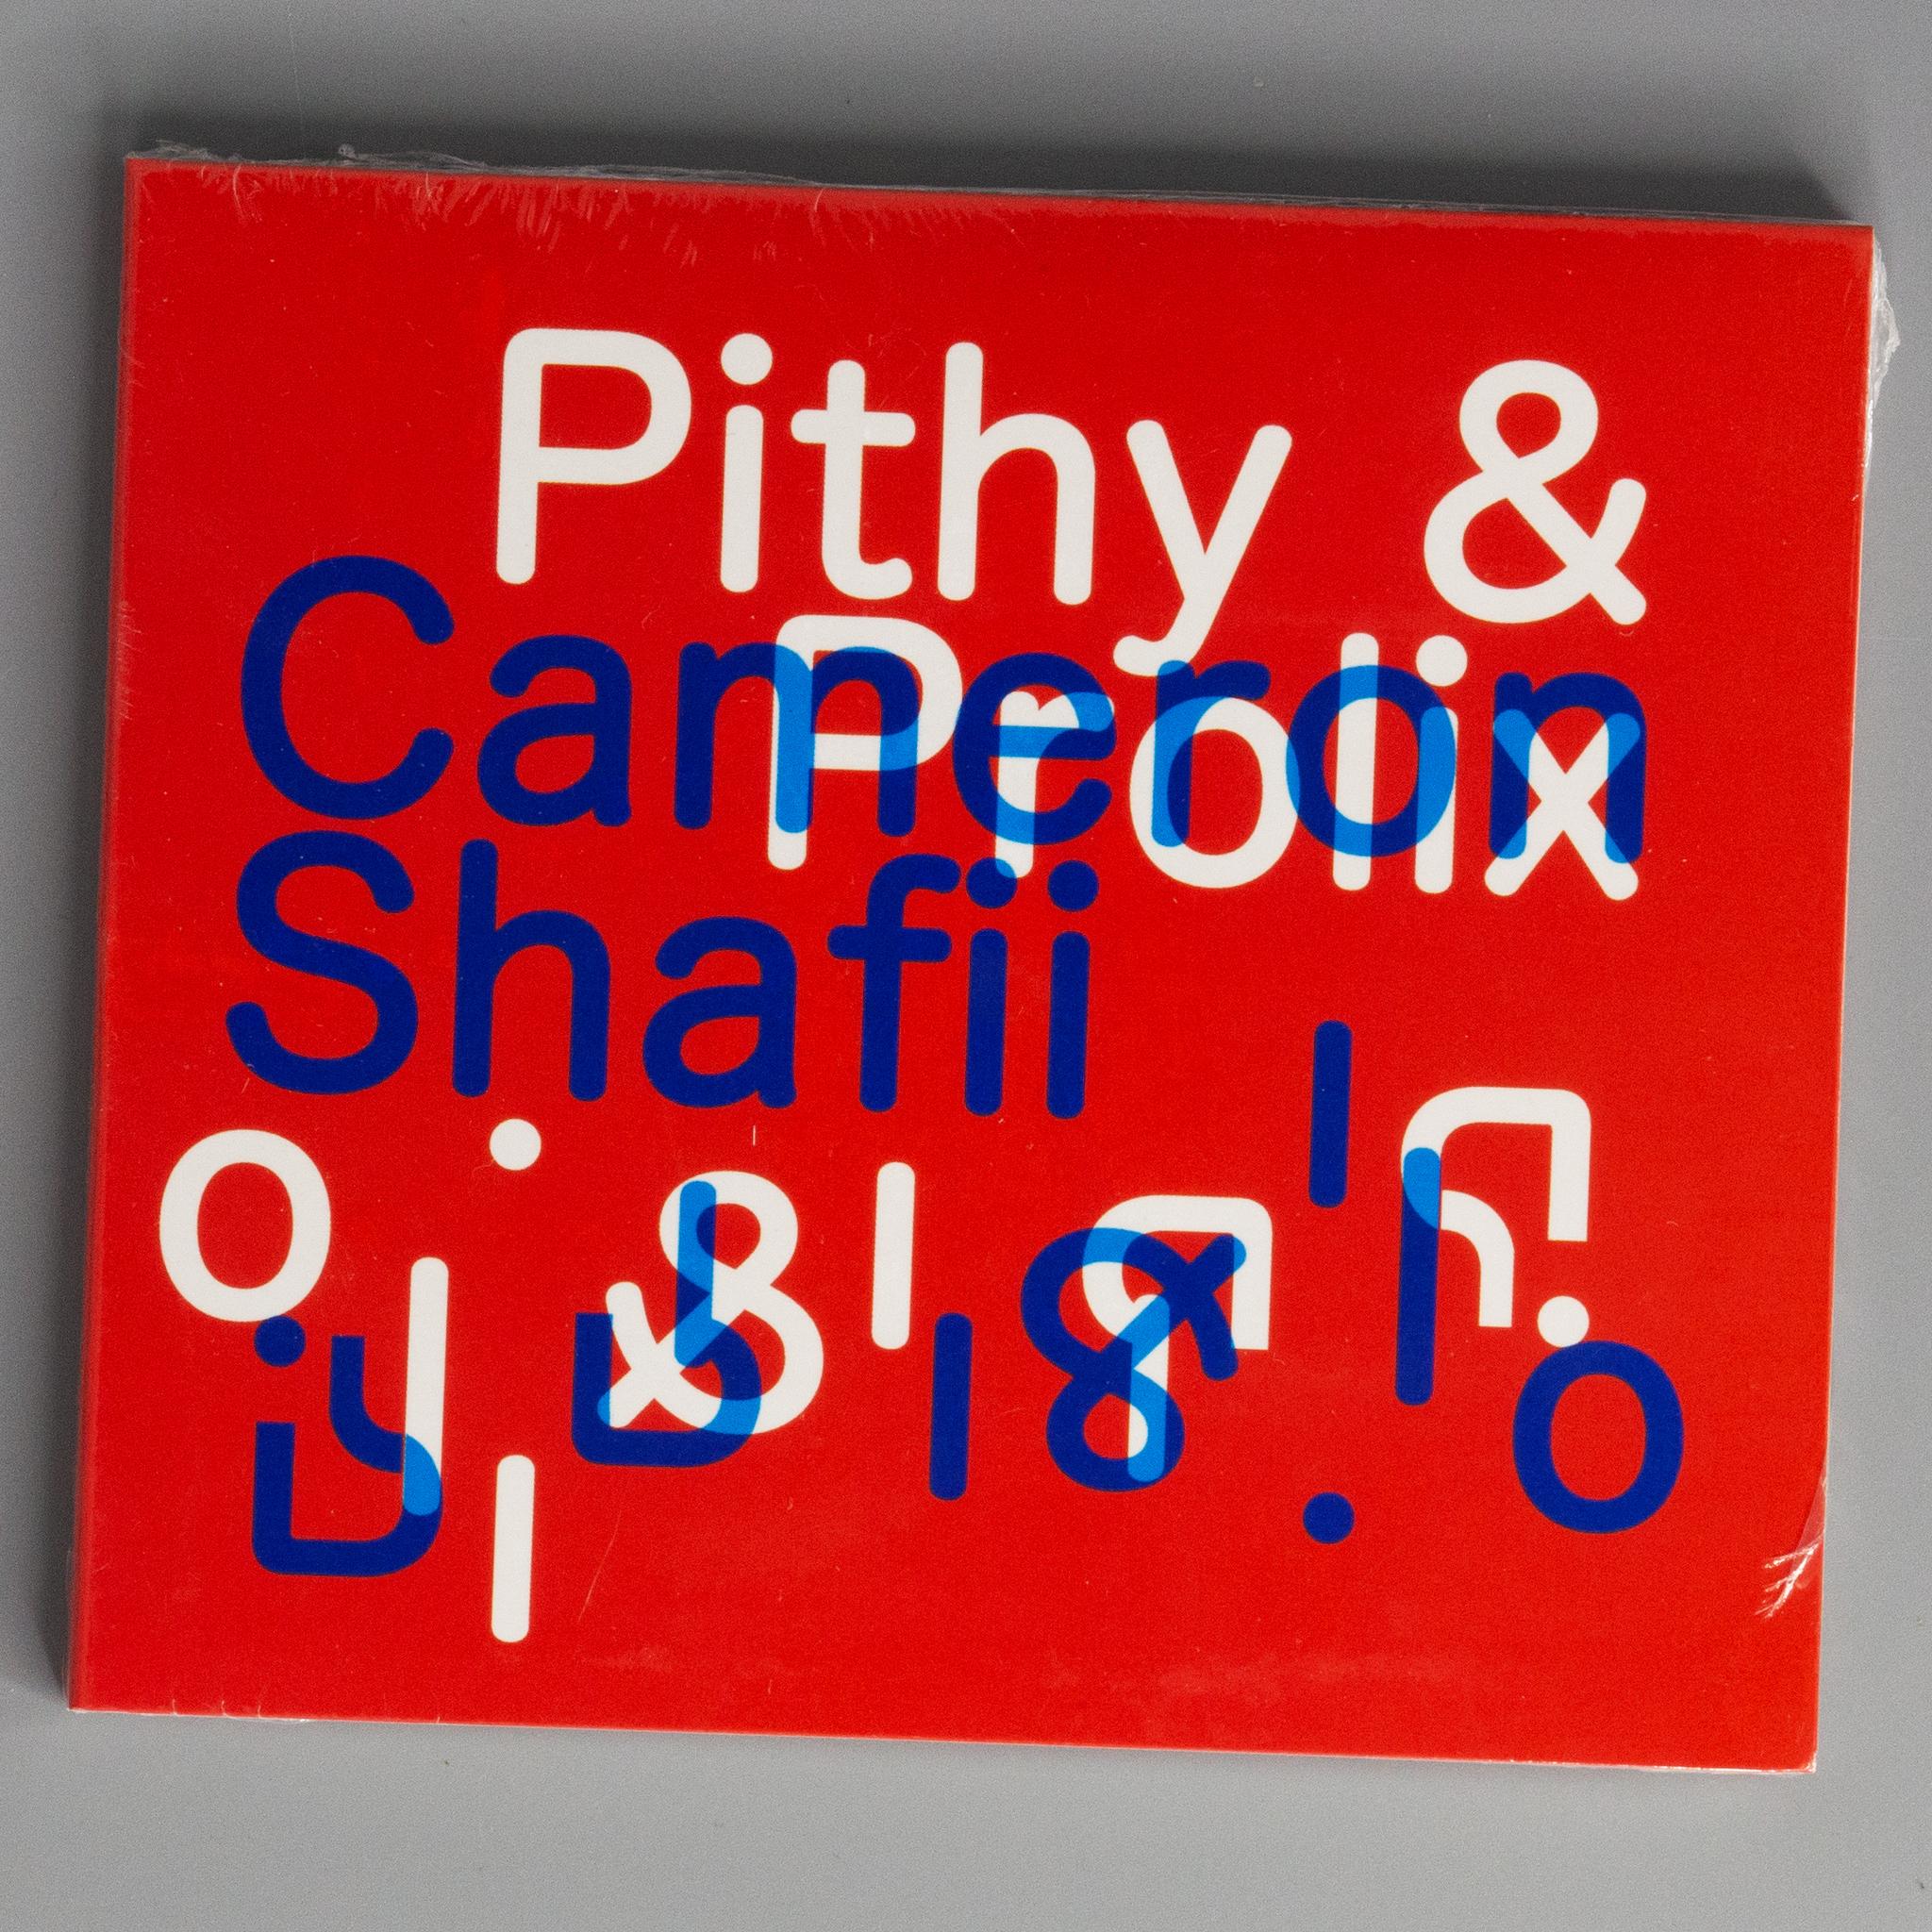 Pithy & Prolix